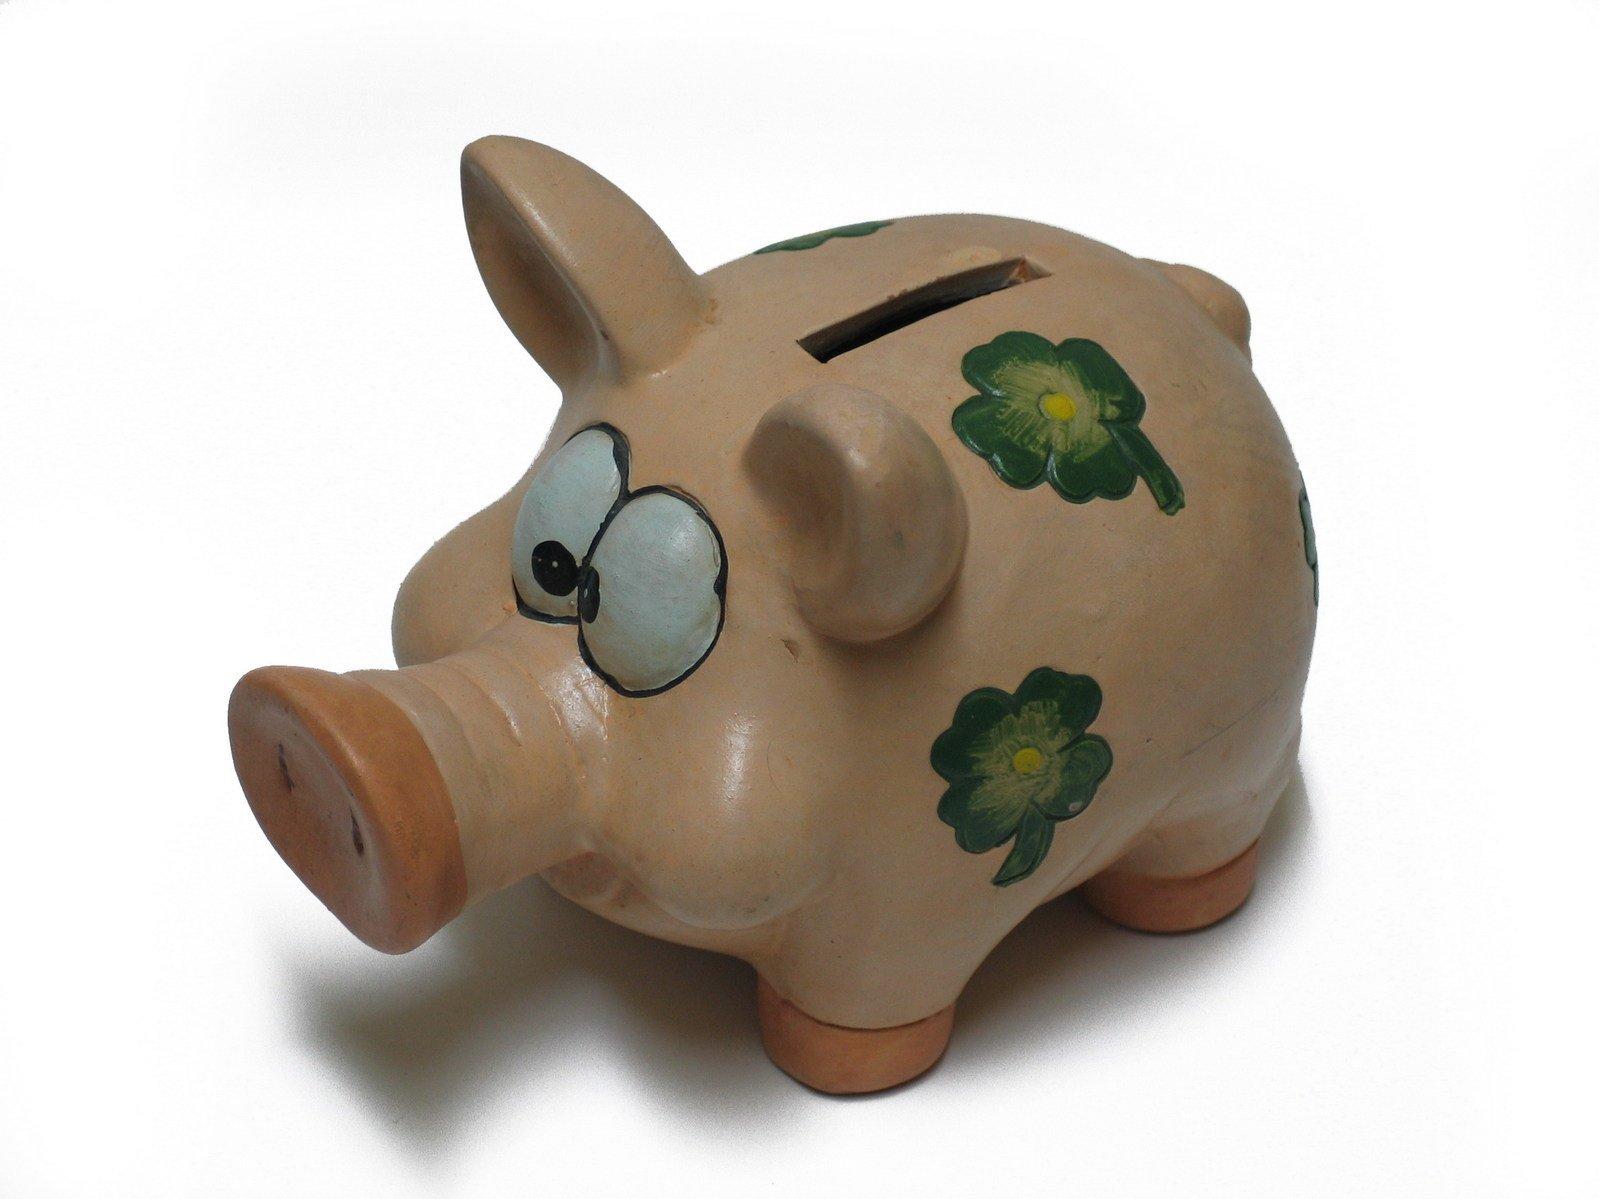 pig,animal,toy,money